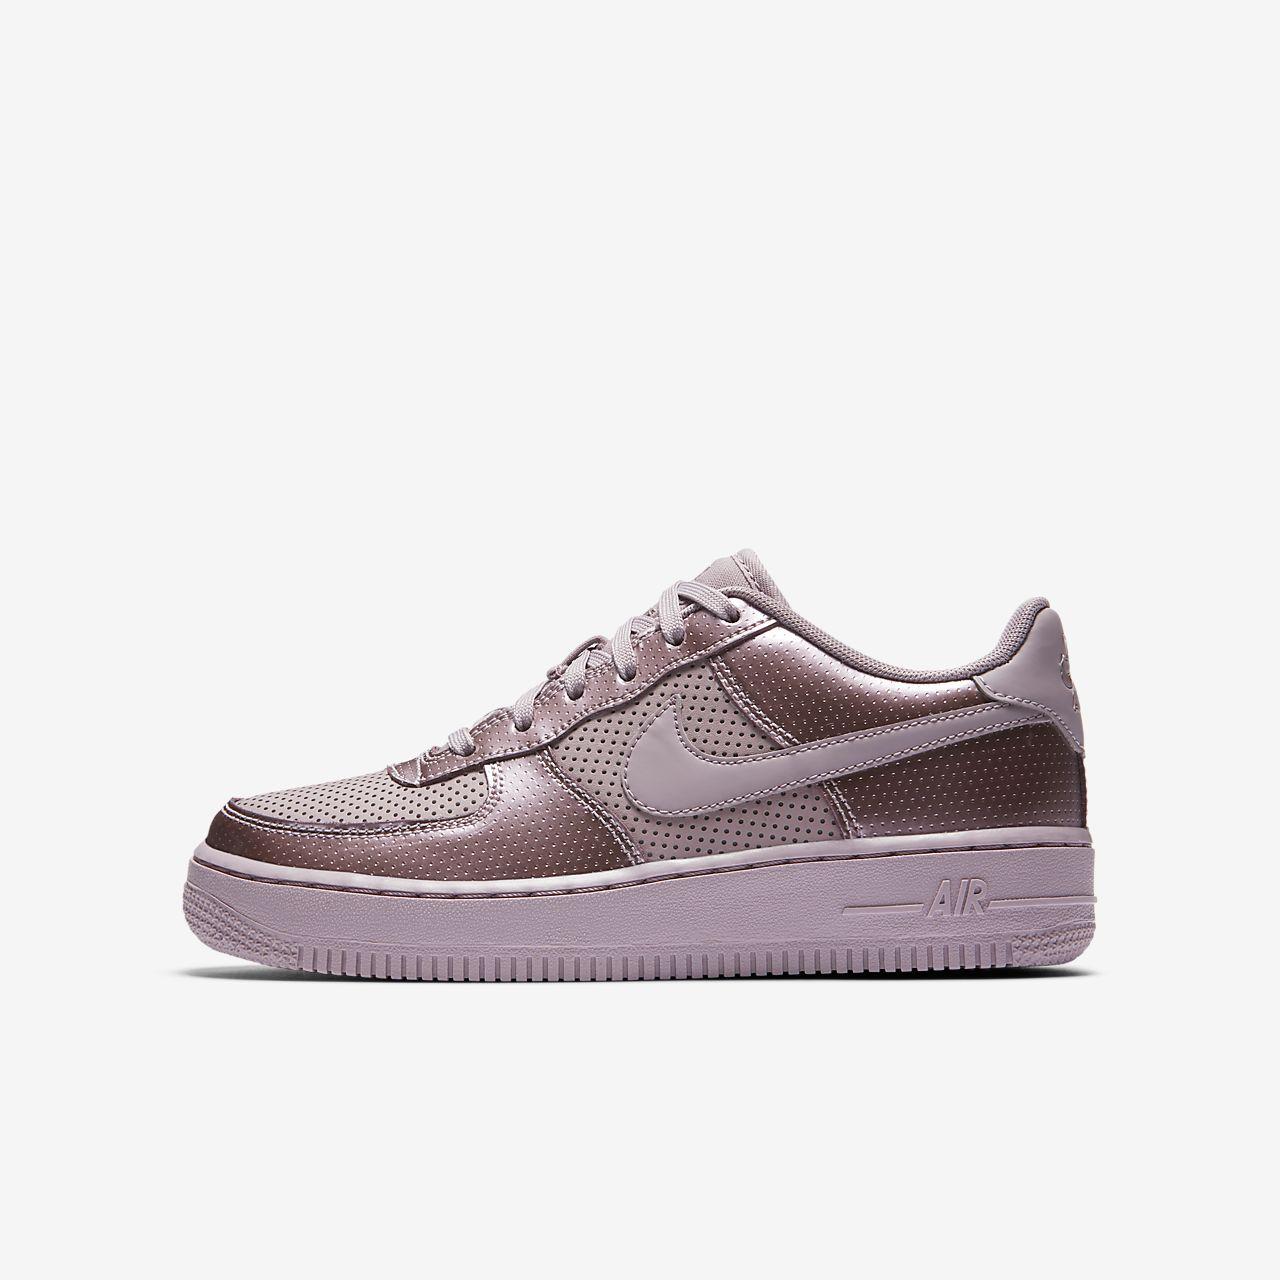 Chaussure Nike Air Force 1 LV8